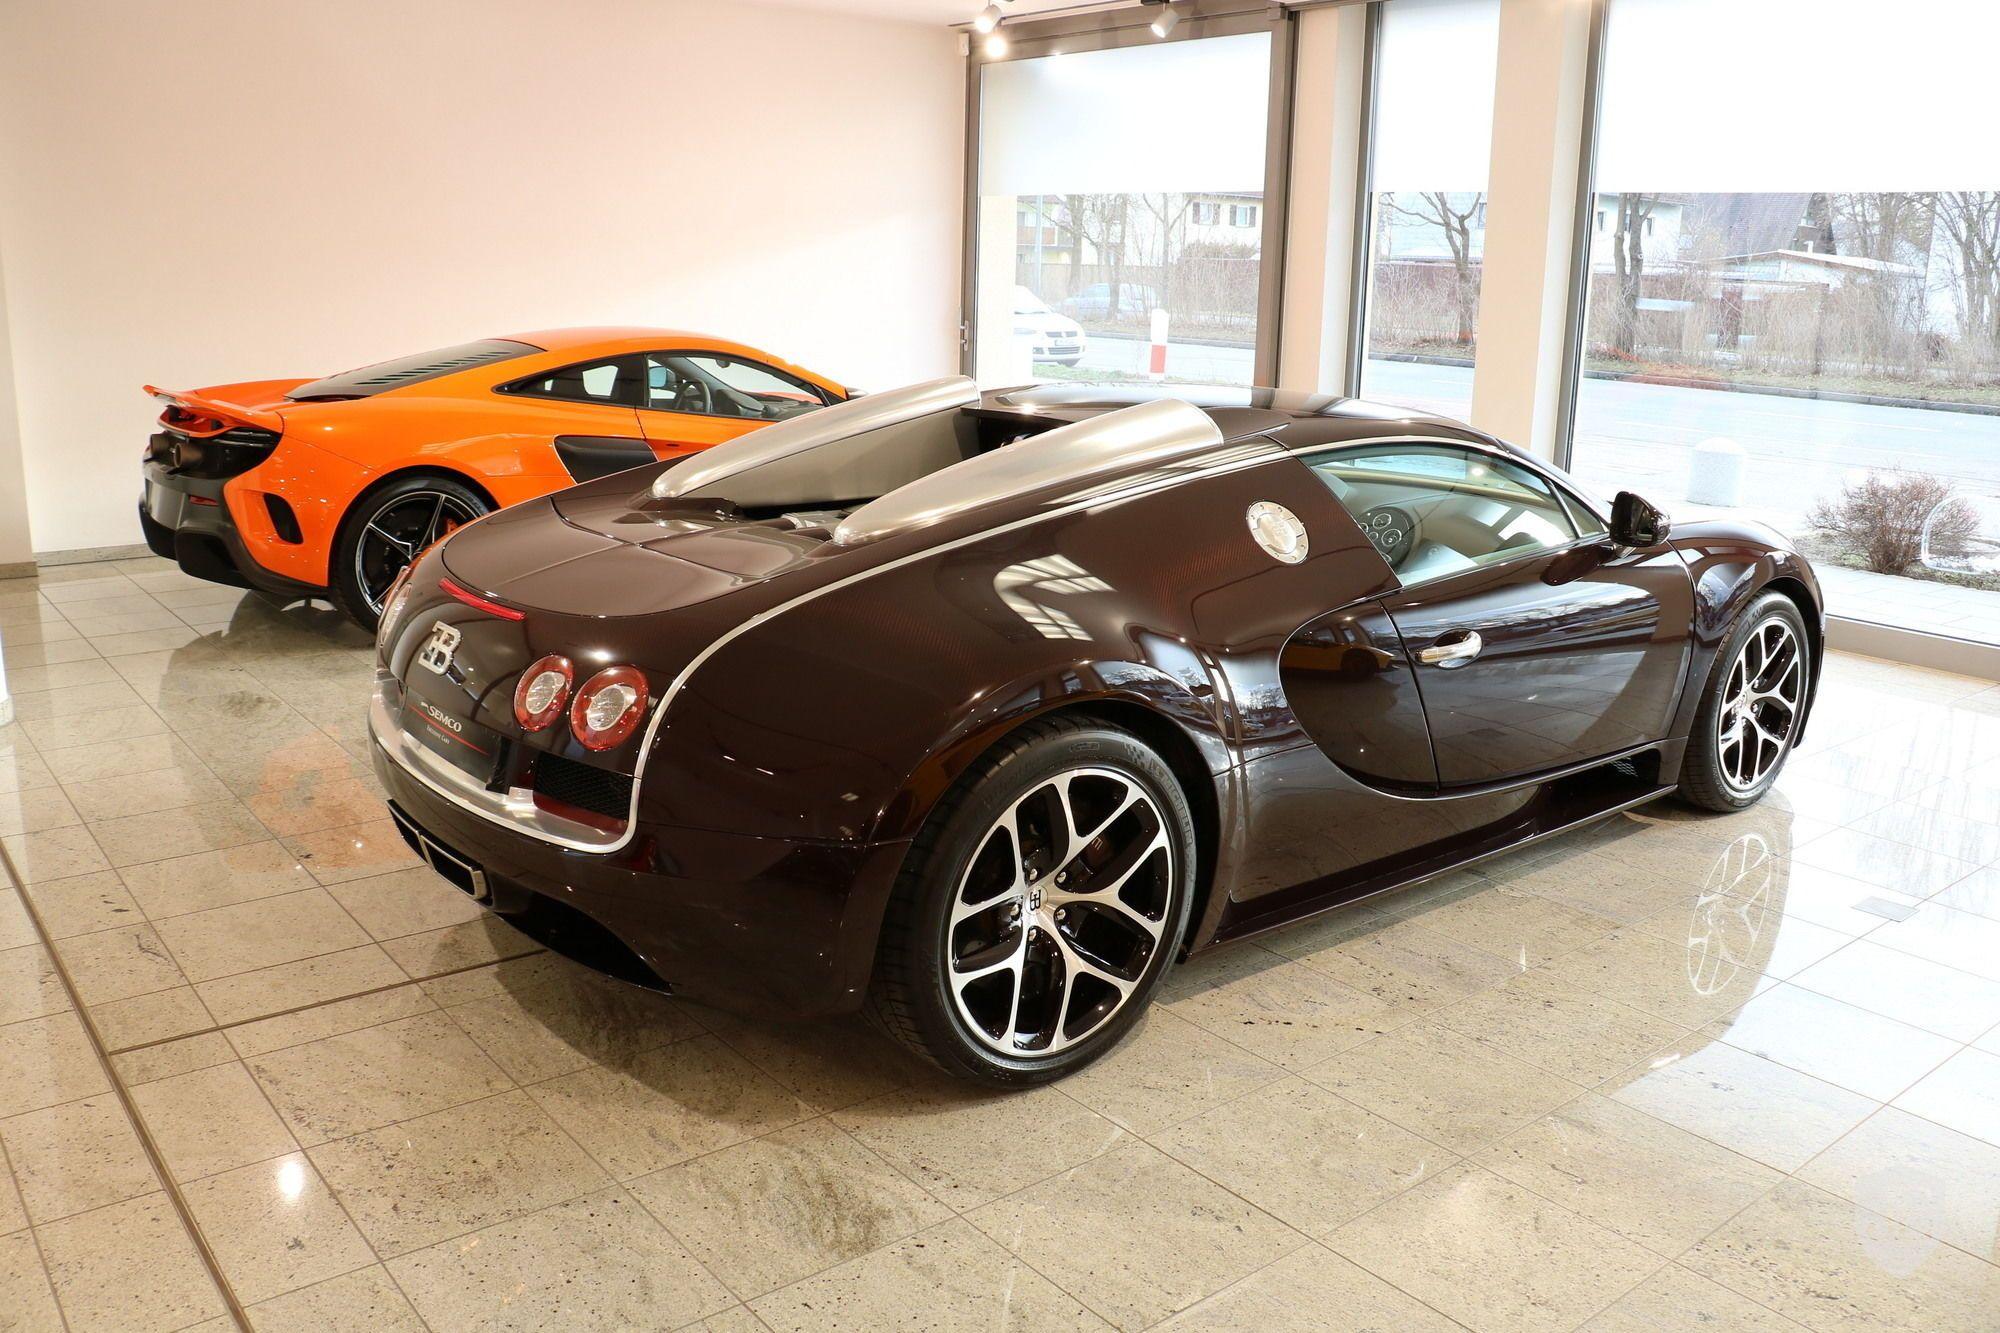 2014 bugatti veyron in haar munich germany for sale on